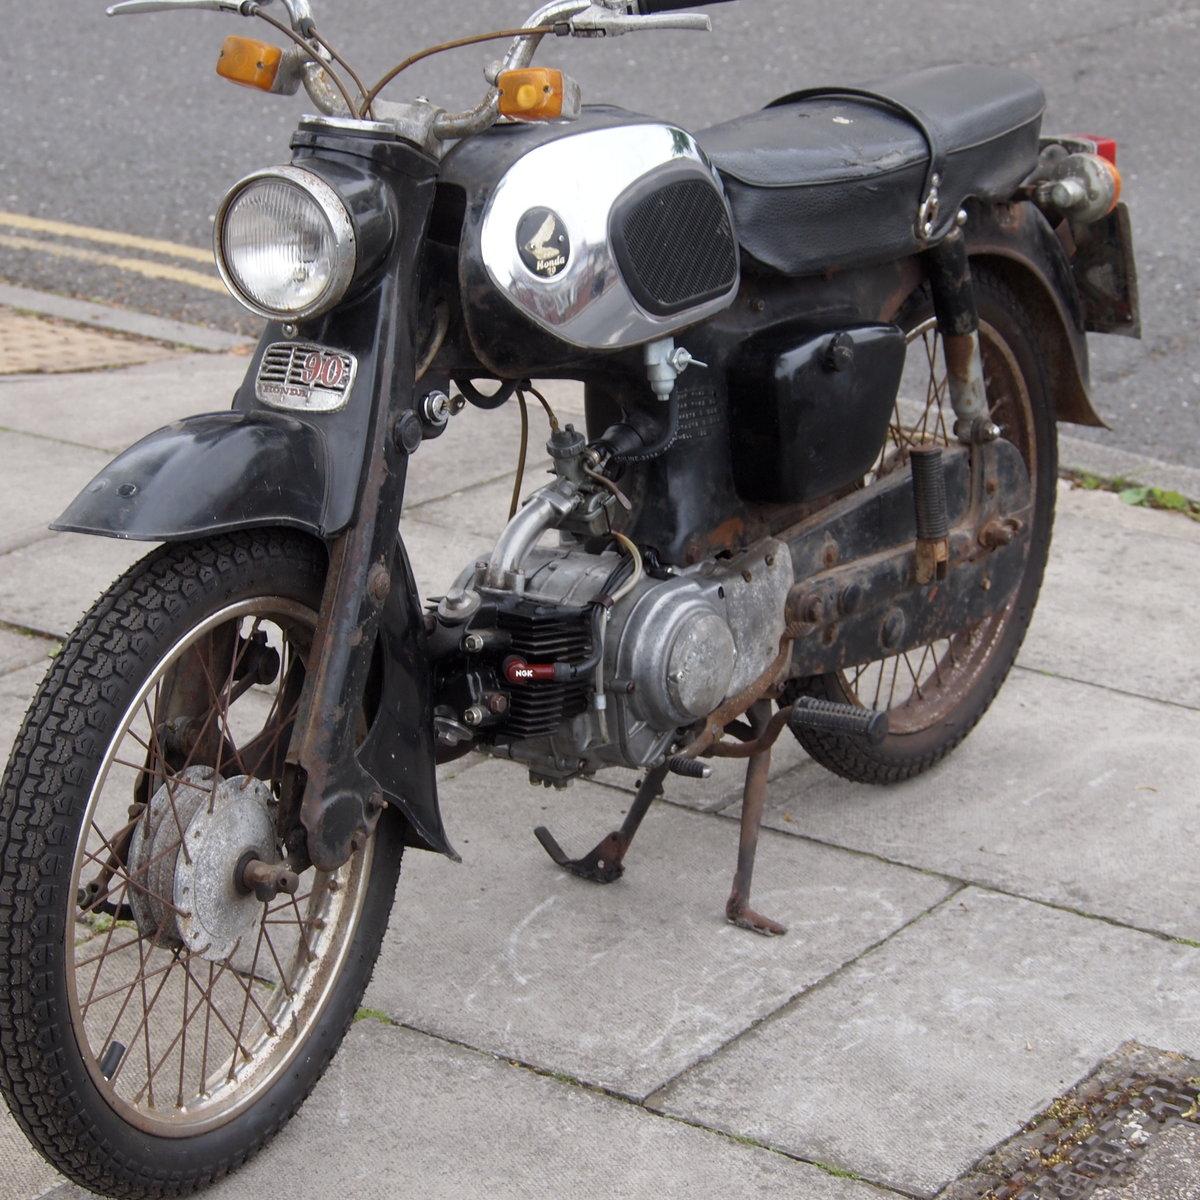 1967 Honda C200 Original Running UK Bike, RESERVED FOR ALAN. SOLD (picture 2 of 6)